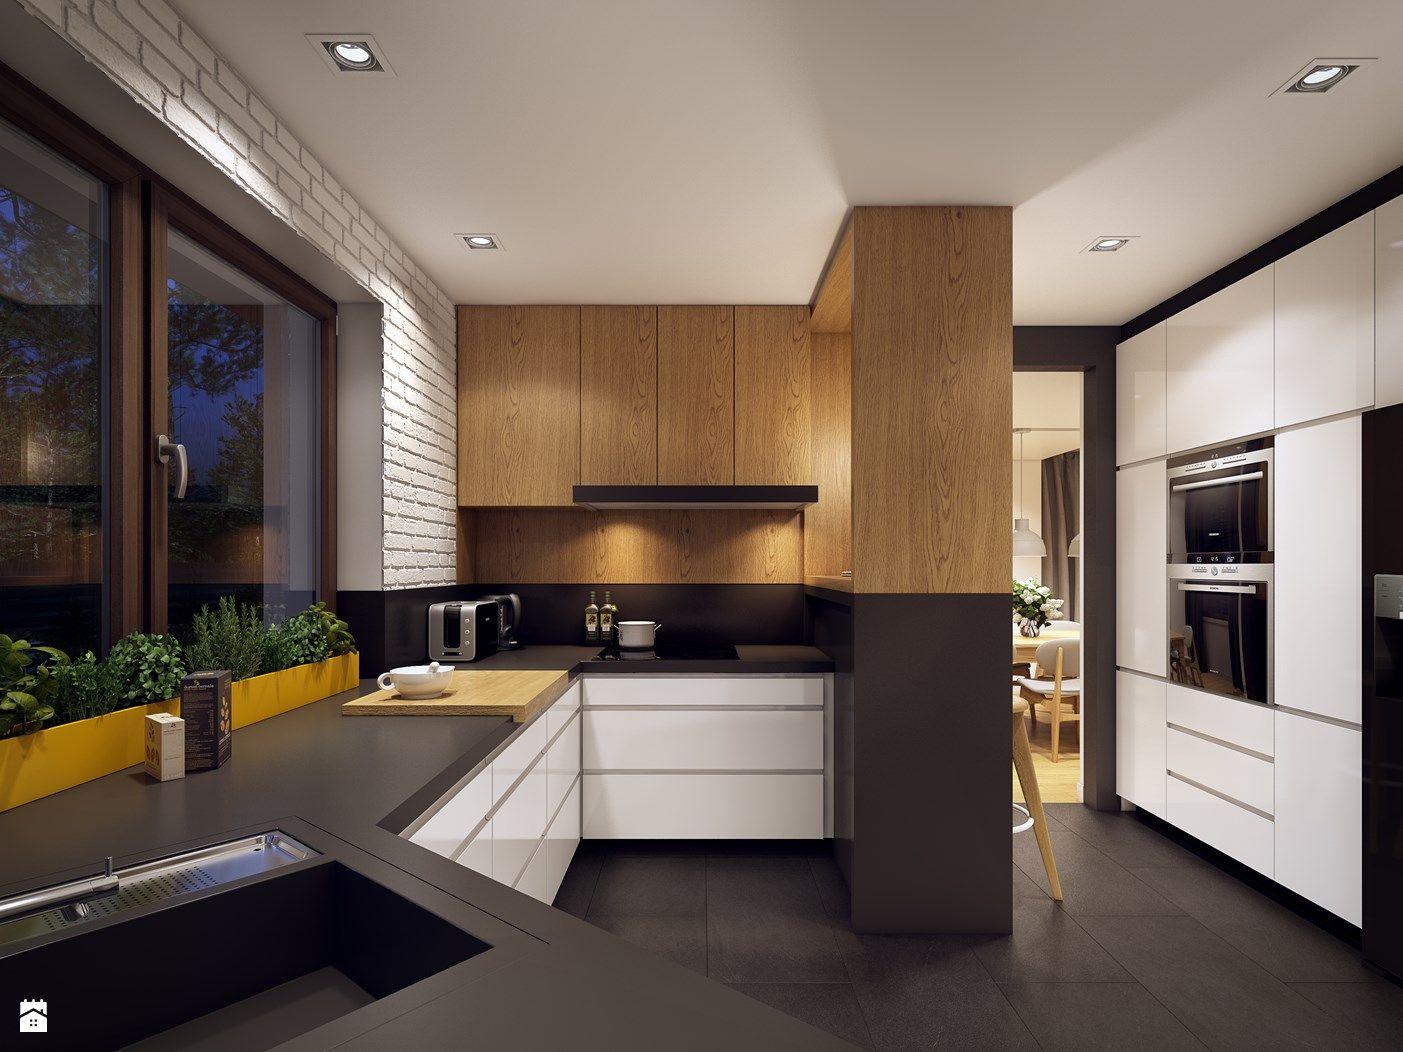 Hermosa Cocina Modular Indio Diseña Fotos Molde - Ideas Del Gabinete ...